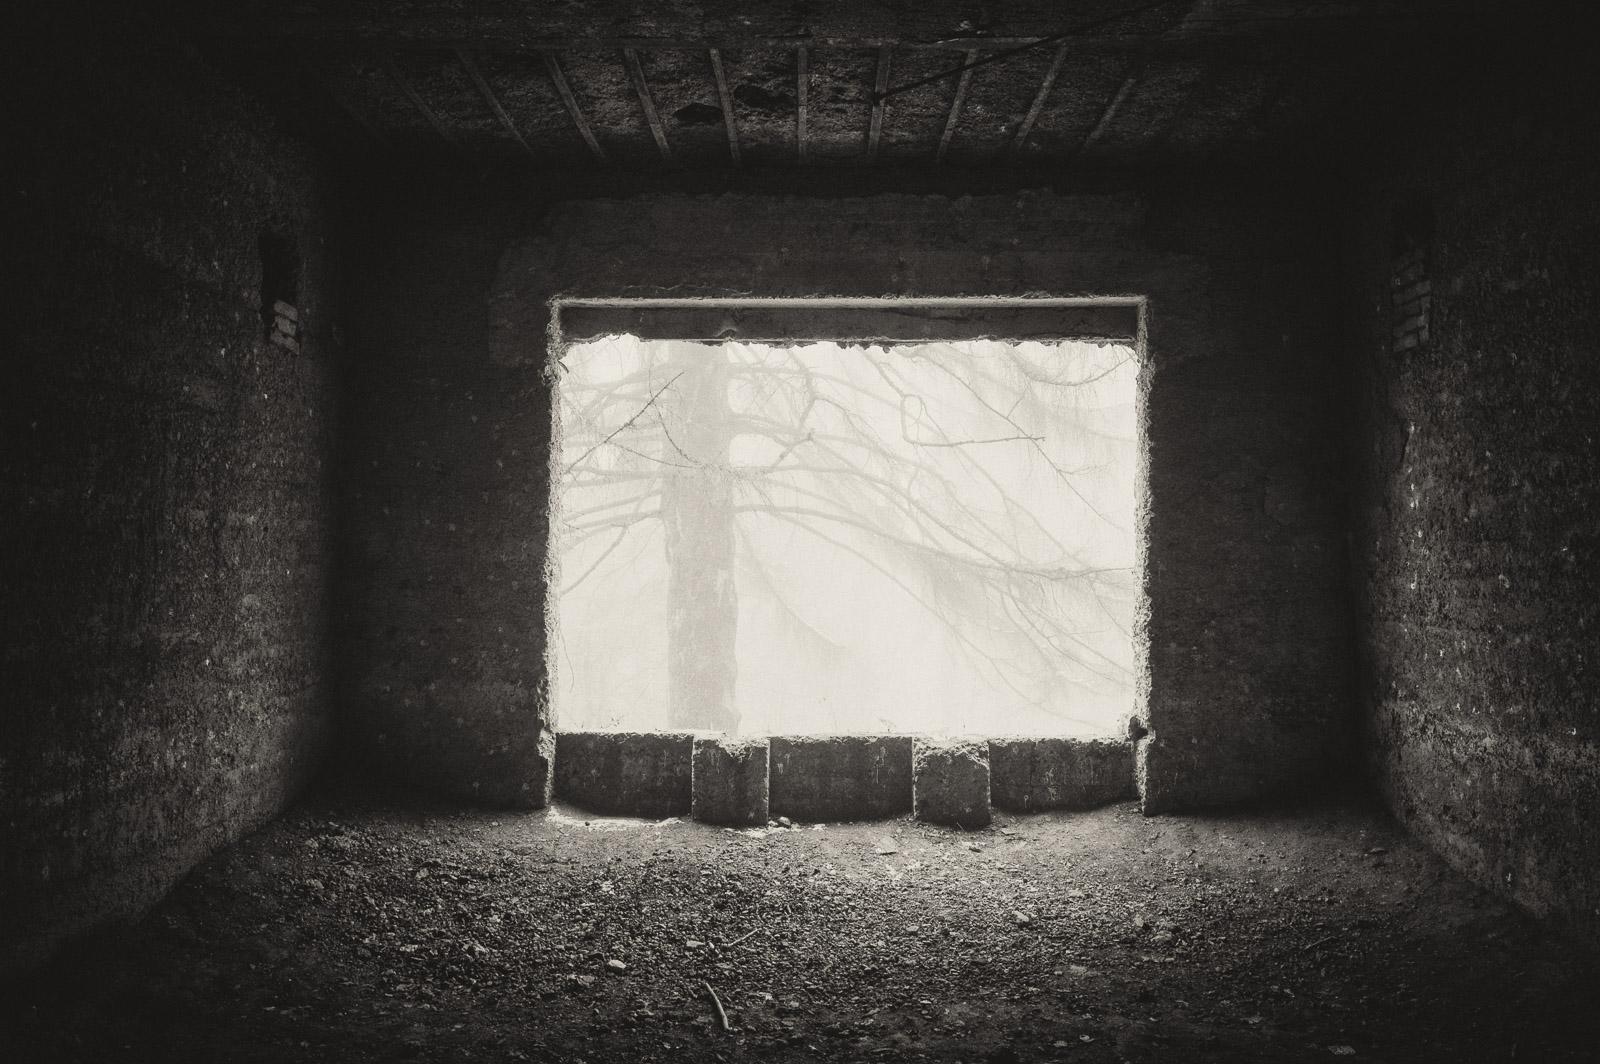 Brestovacs sanatorium